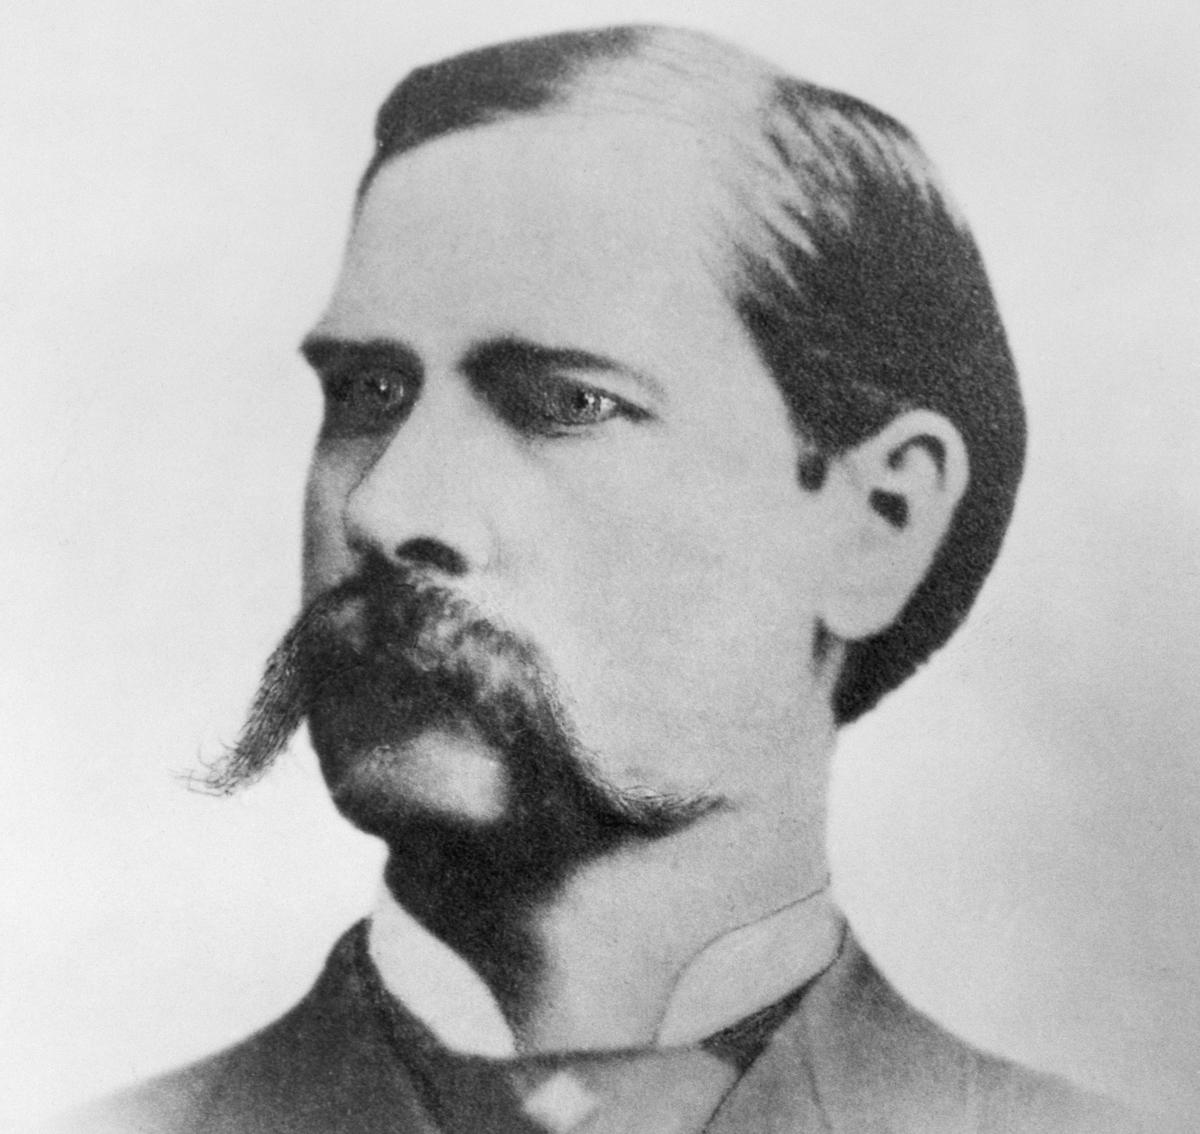 Portrait of Marshall Wyatt Earp, 1886